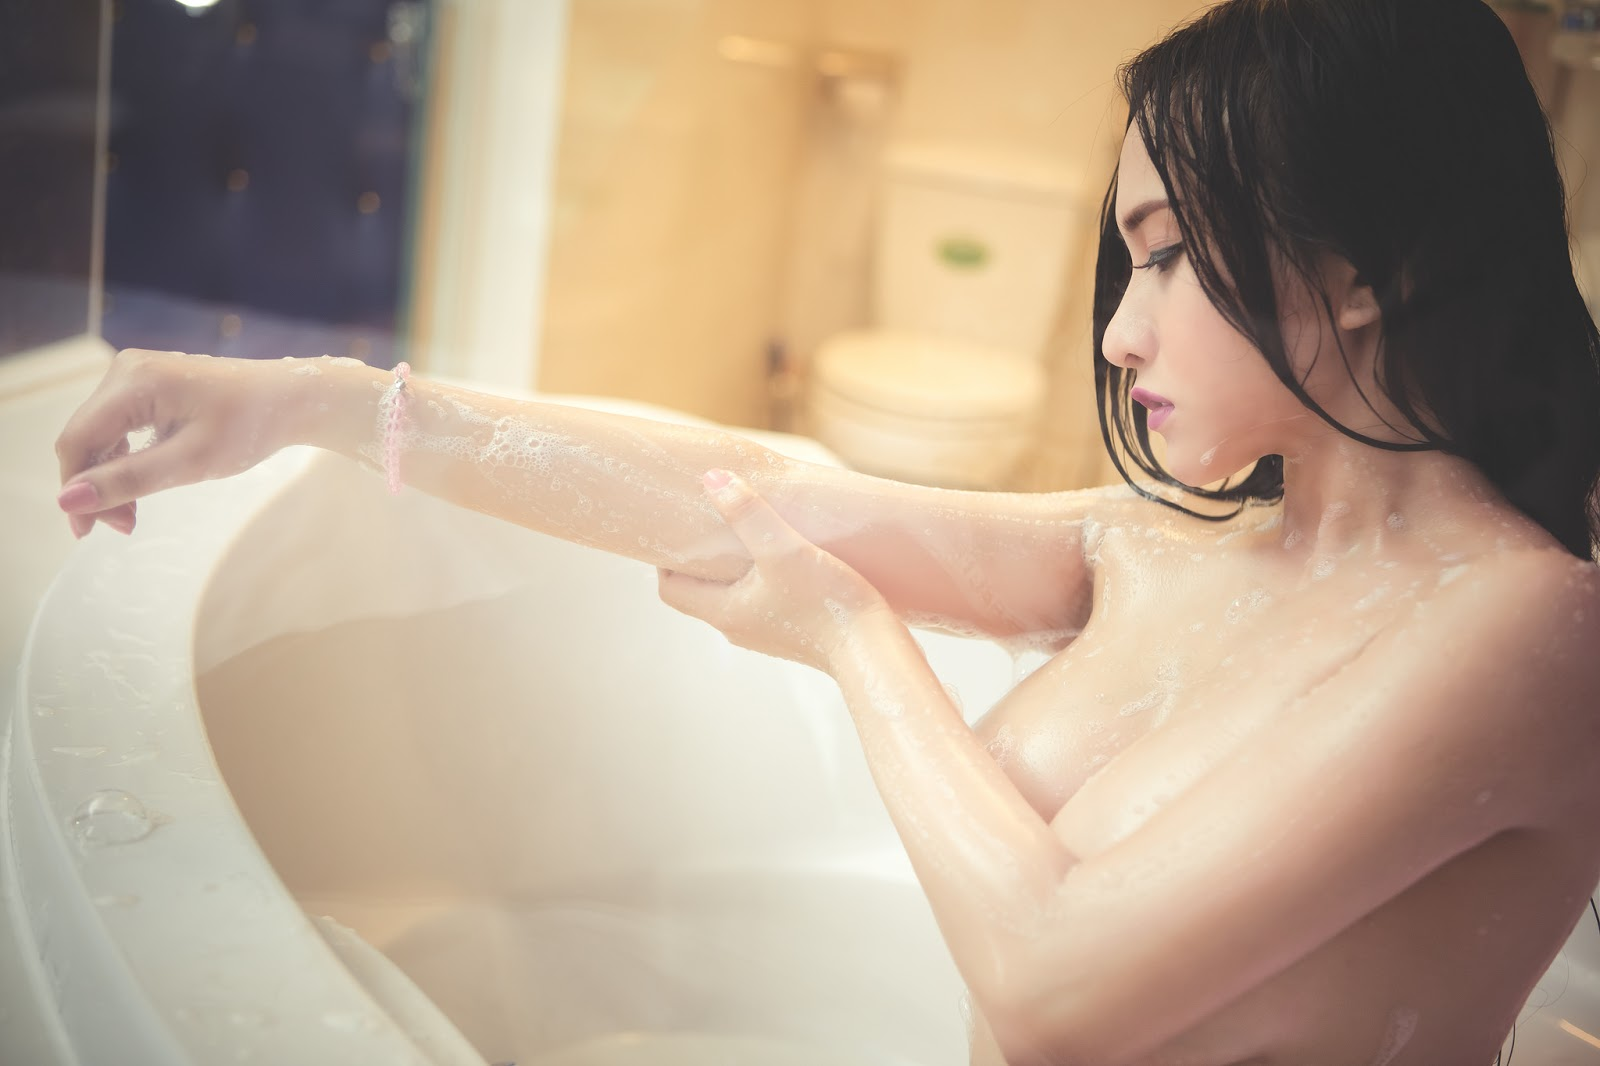 anh-nude-hot-girl-11.jpg